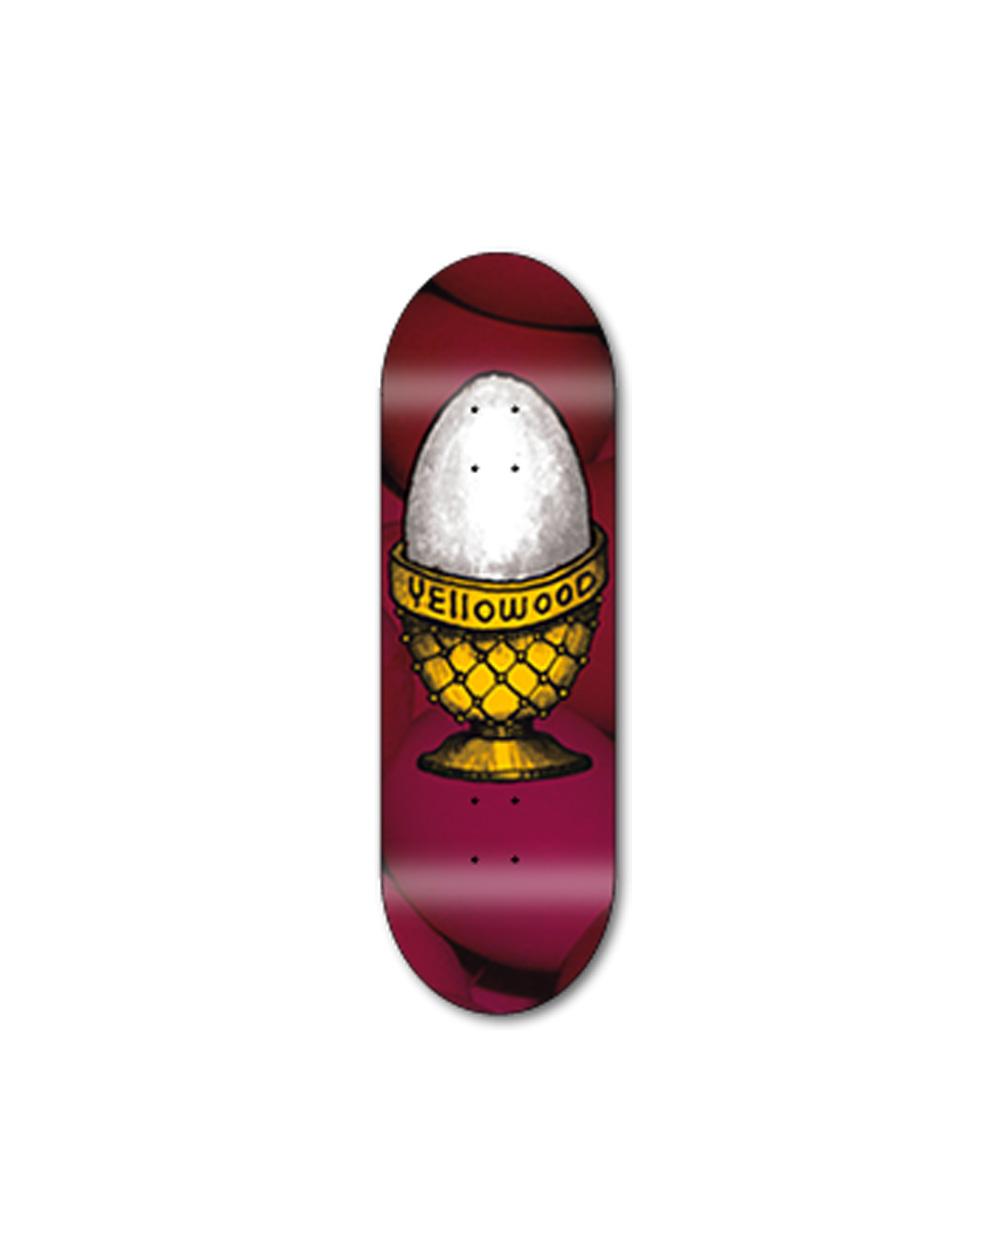 Yellowood Shape Fingerboard Egg Z3